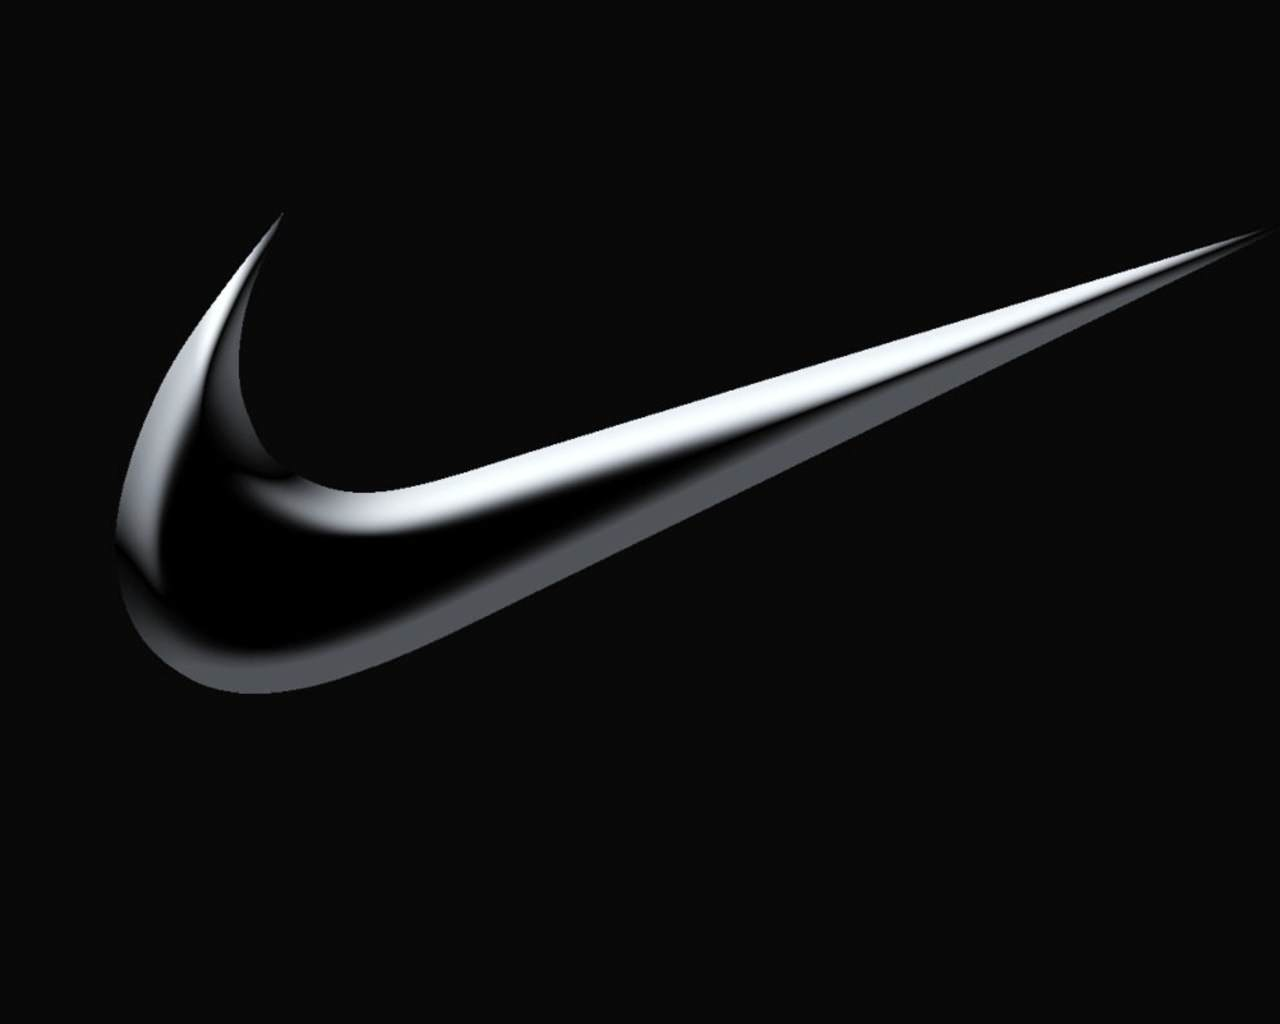 ajustar Altitud Centralizar  Nike Logo 3d posted by Sarah Peltier